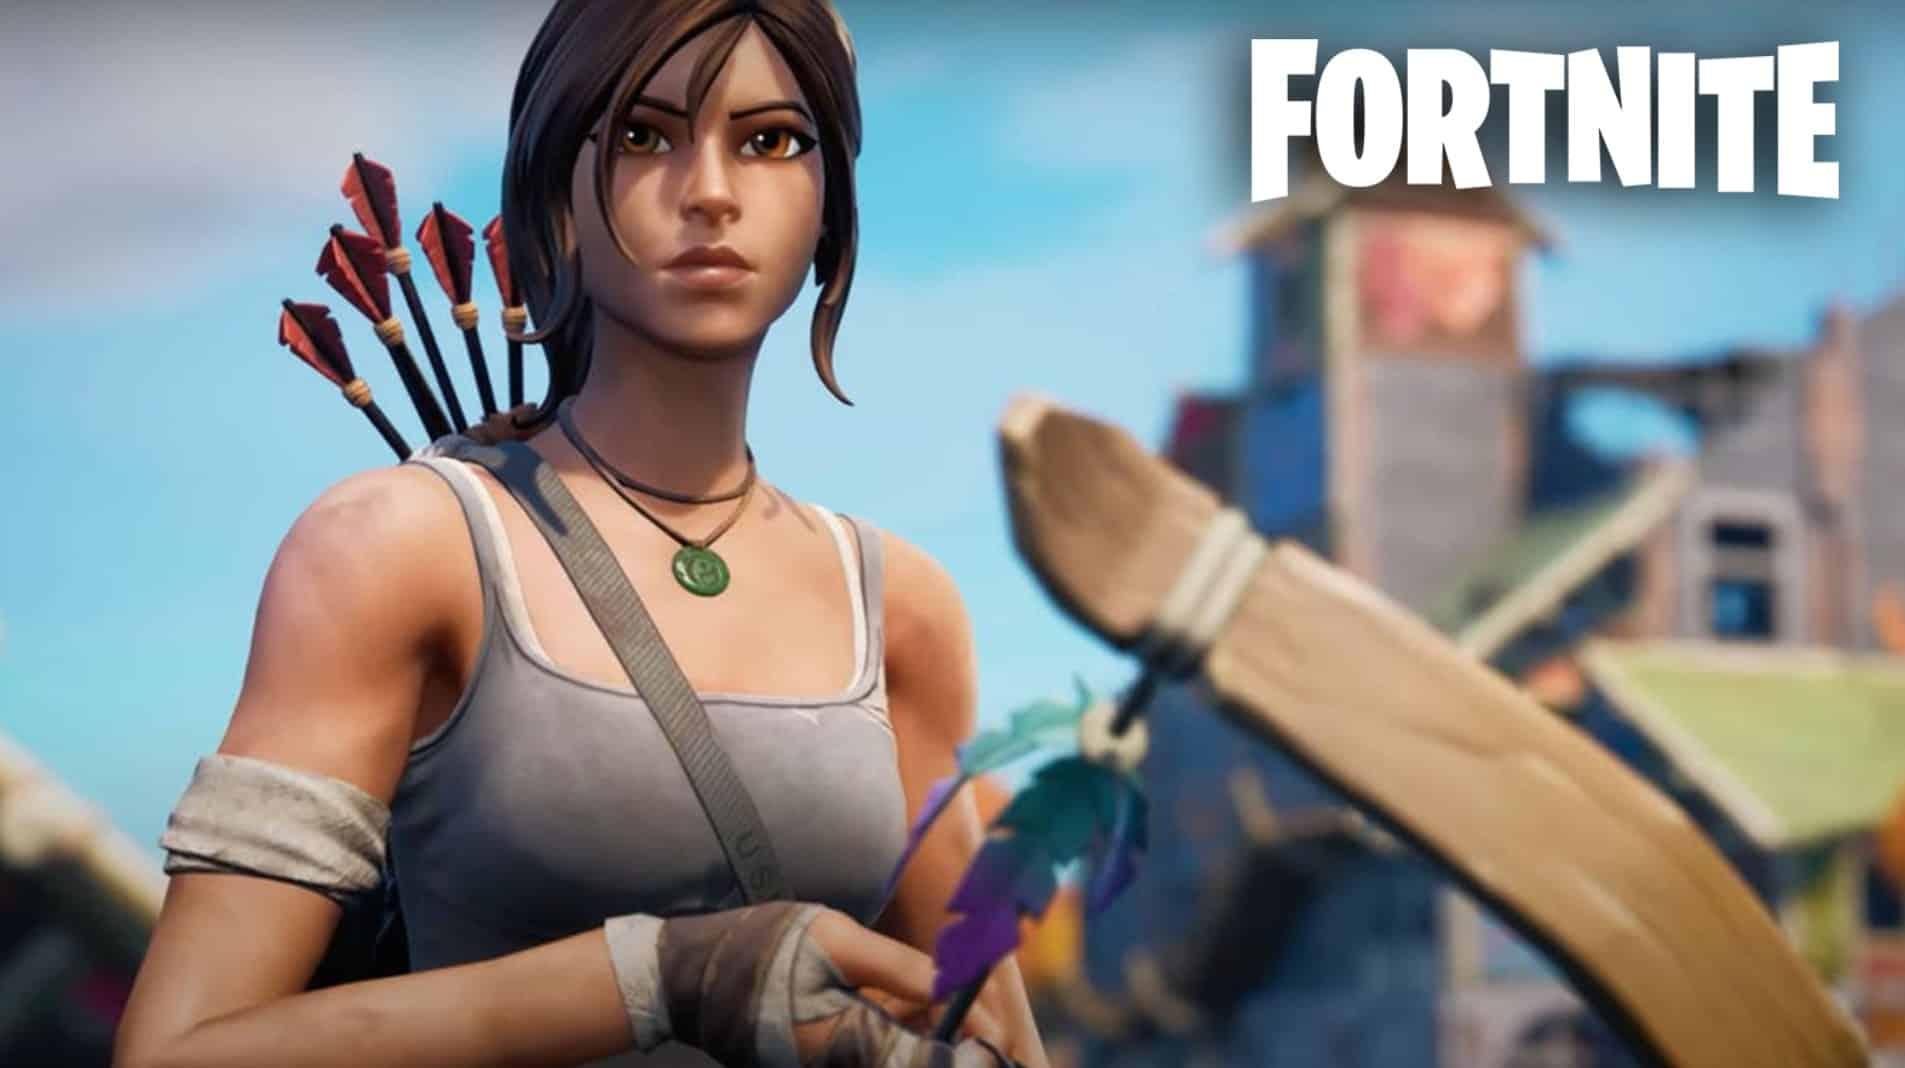 Lara Croft NPC Fortnite